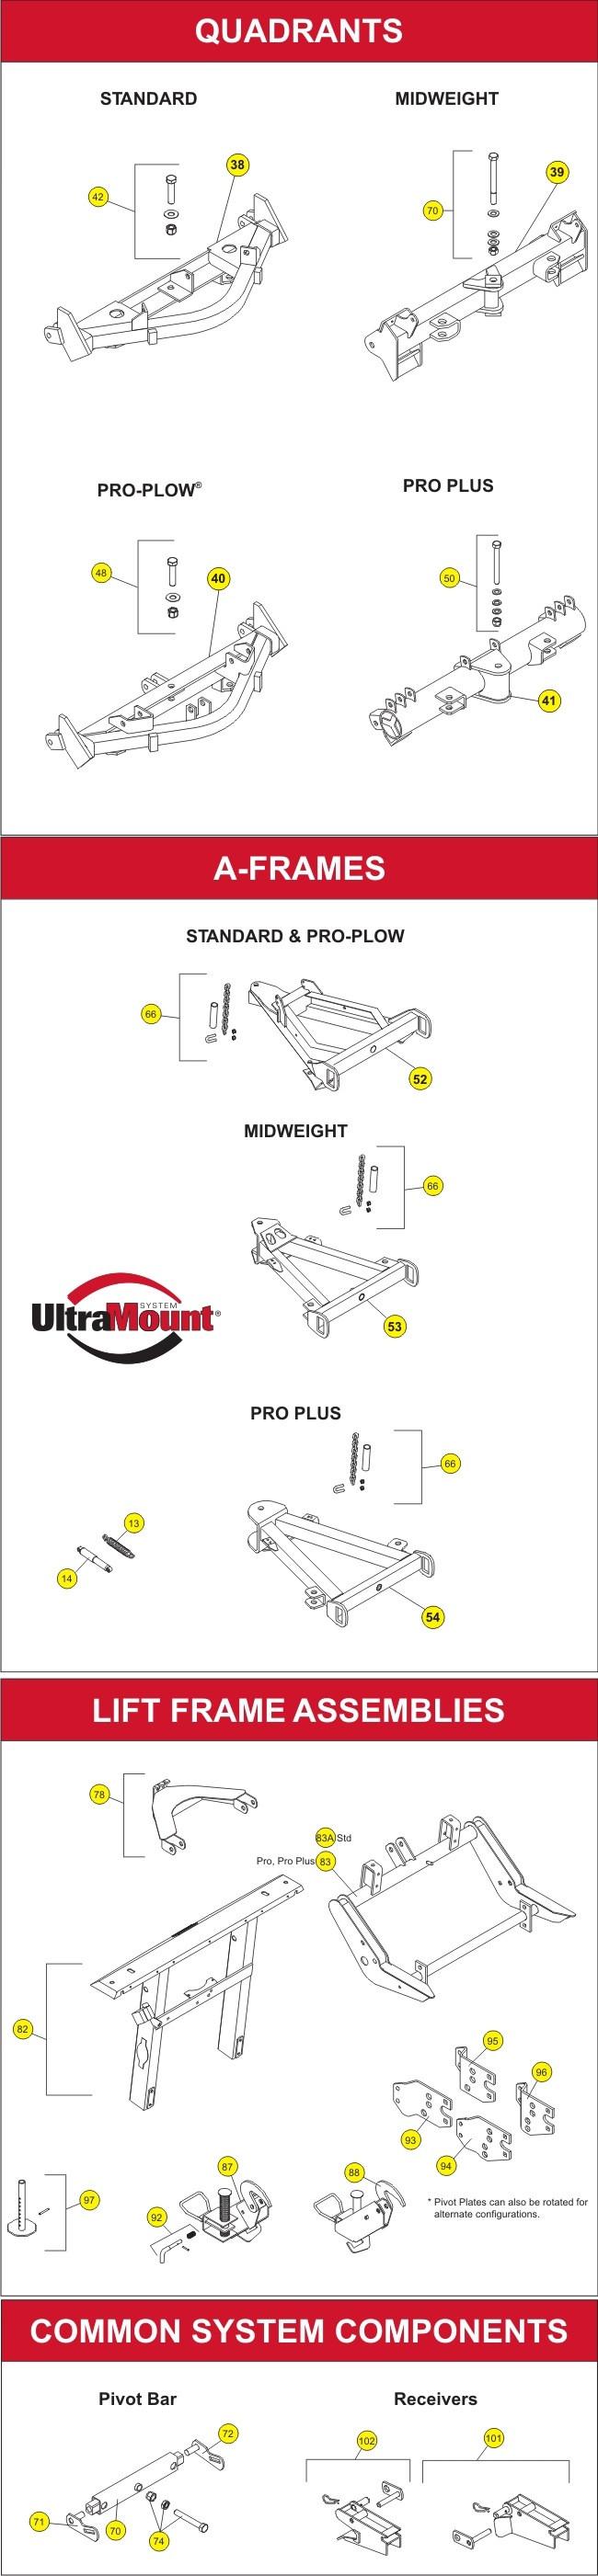 western pro plow wiring diagram br 0635  used western snow plows in addition western snow plow  used western snow plows in addition